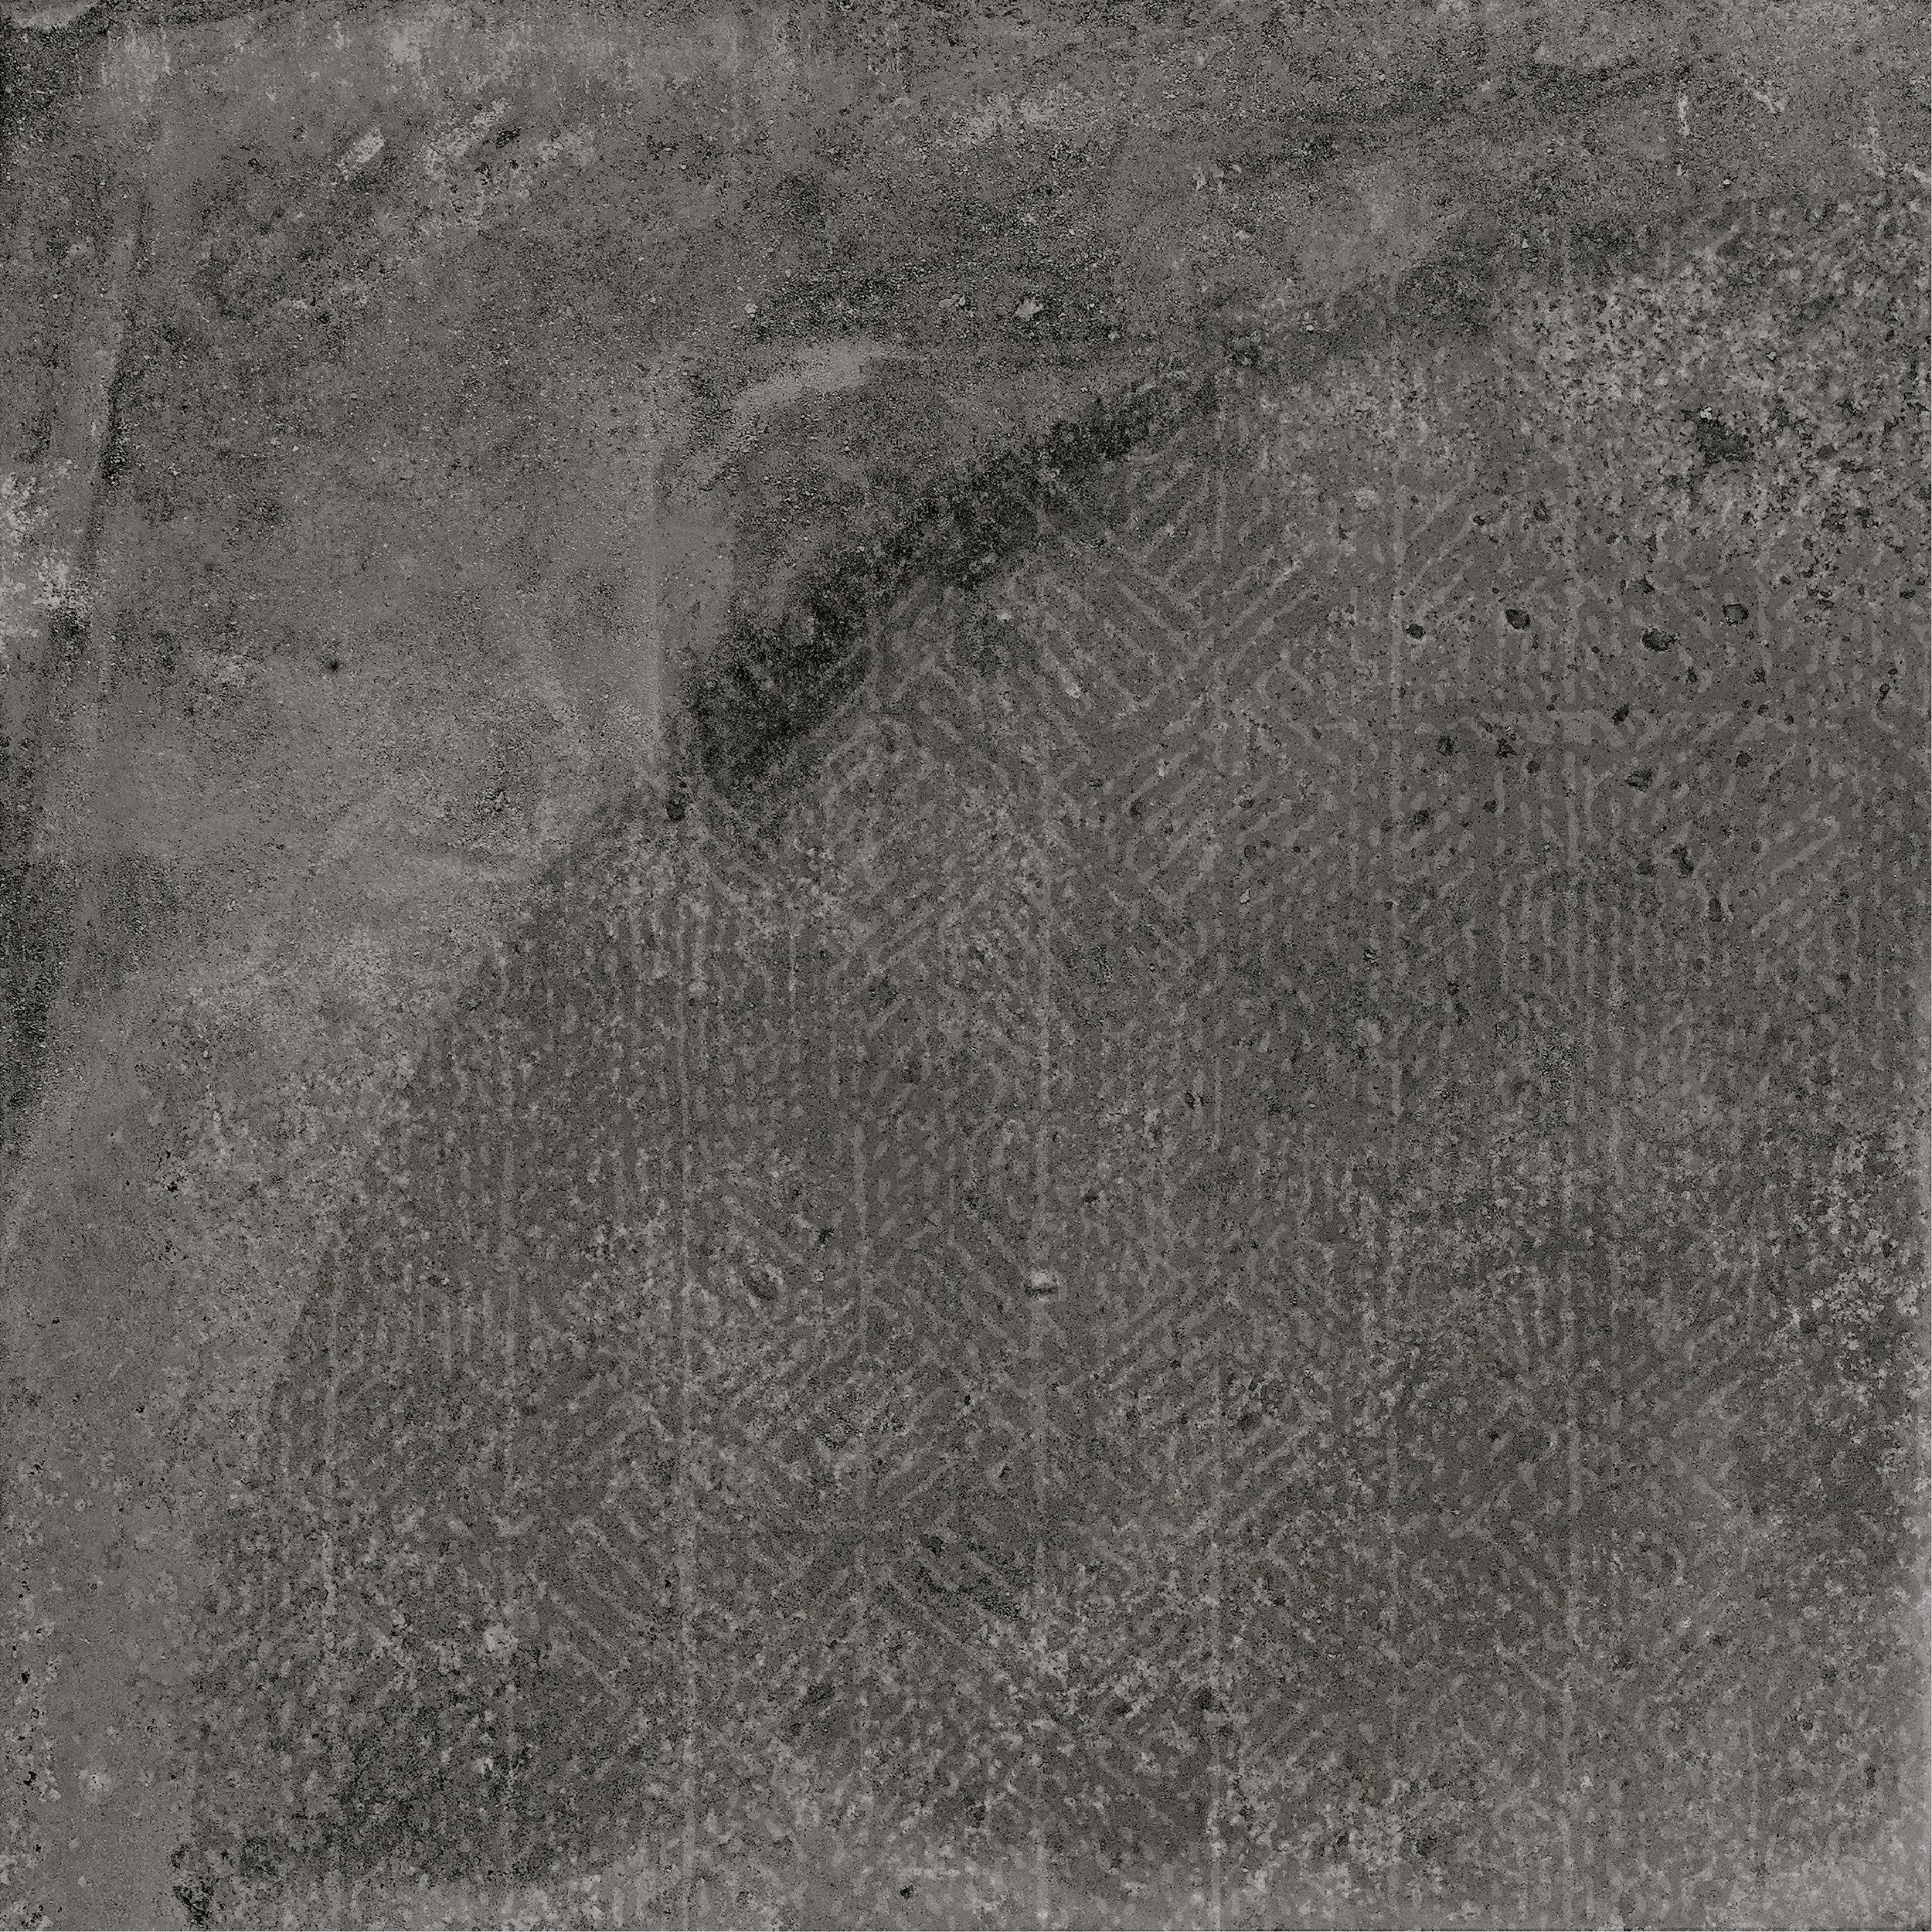 Urban Arco Dark 20x20 cm